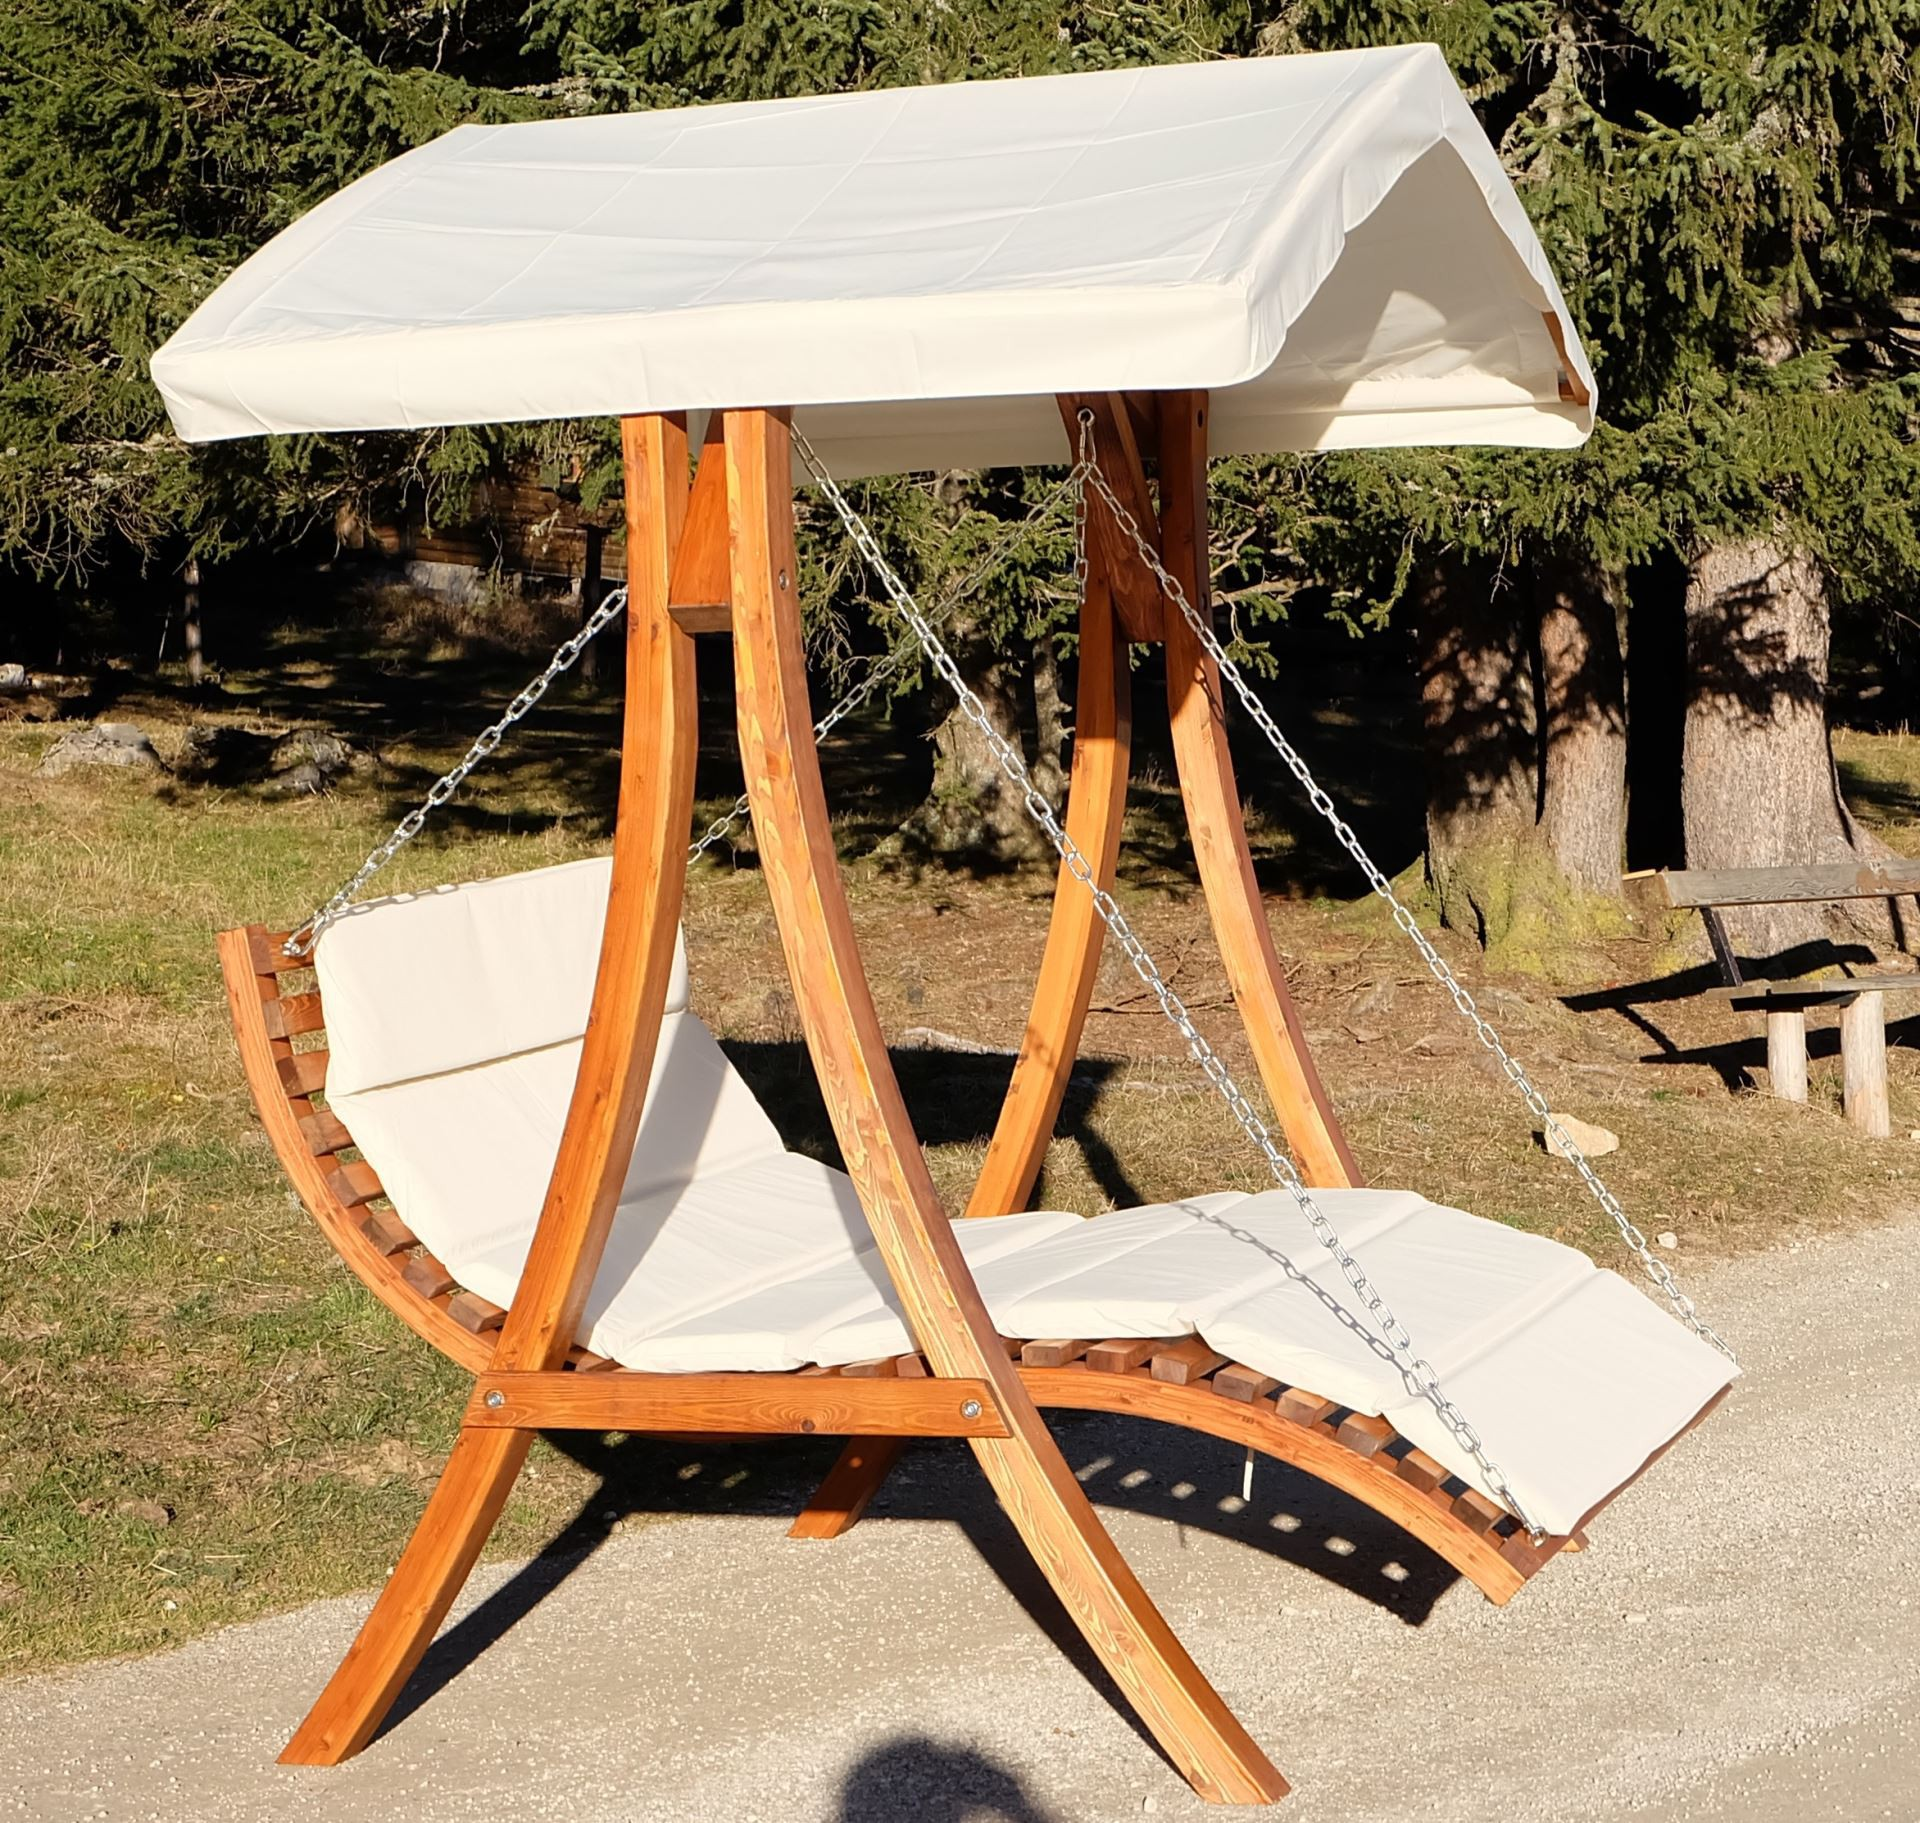 hollywoodschaukel gartenschaukel hollywoodliege. Black Bedroom Furniture Sets. Home Design Ideas